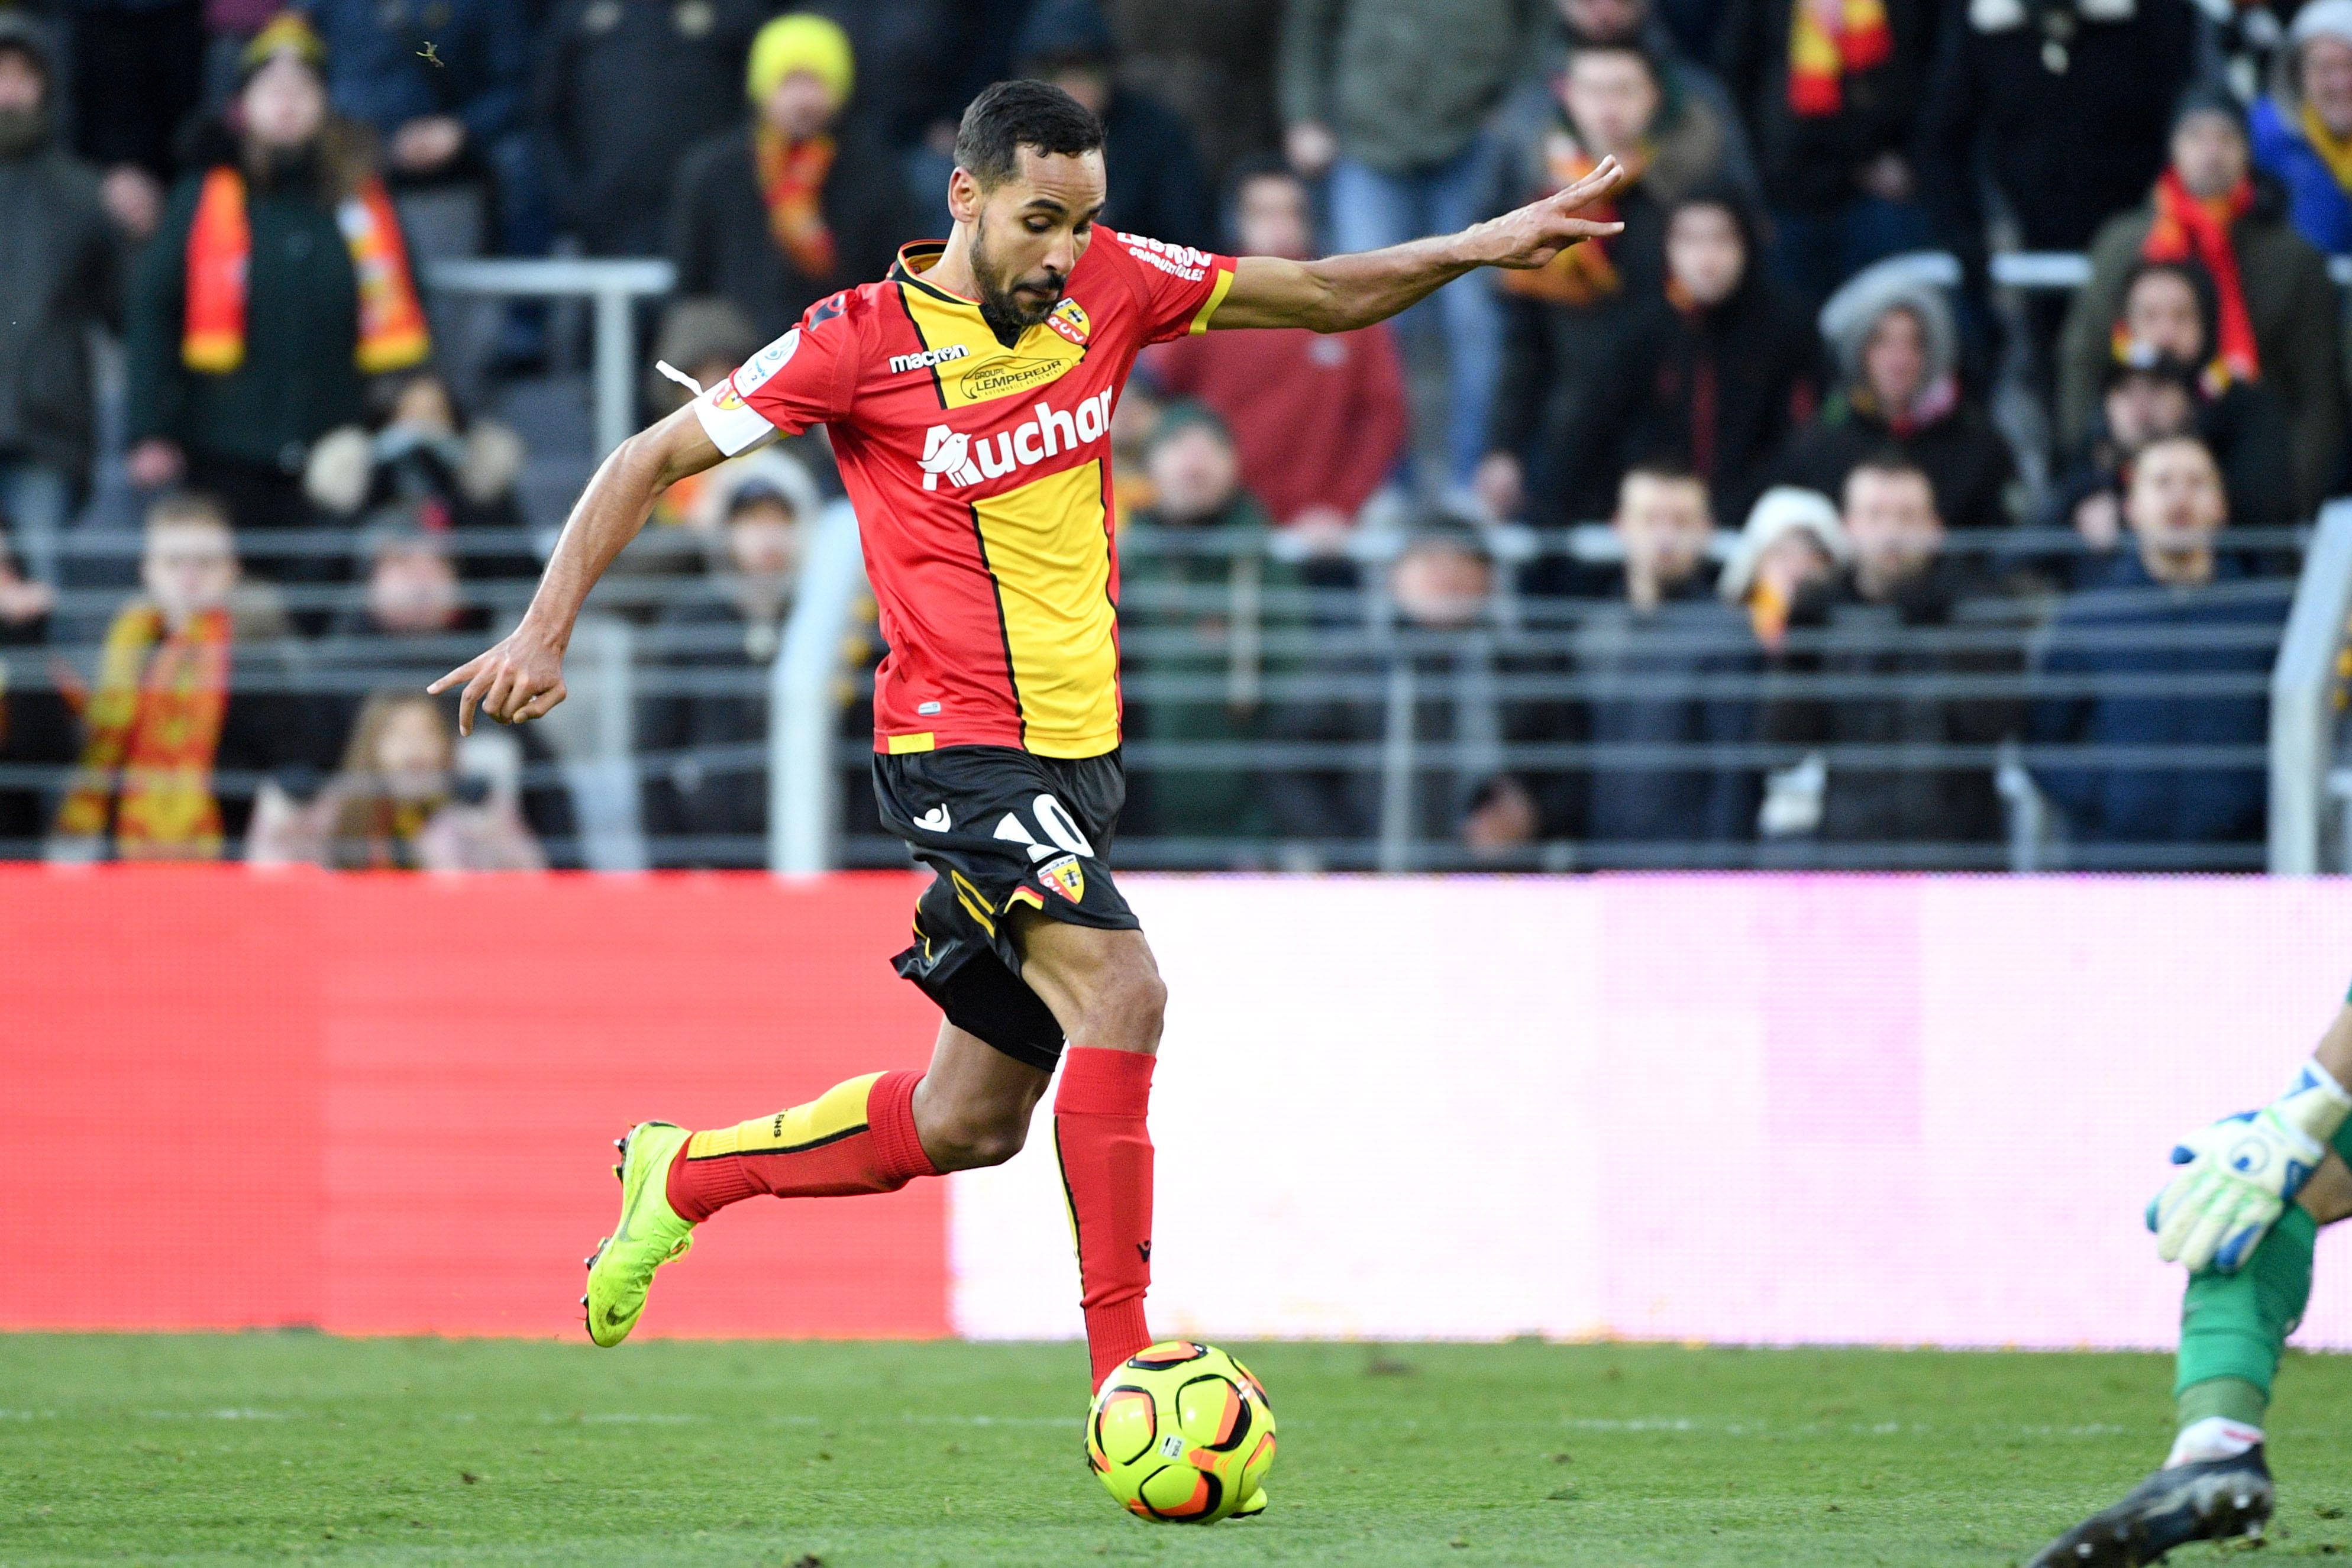 Football - Ligue 2 - Ligue 2 : Troyes-Lens en direct